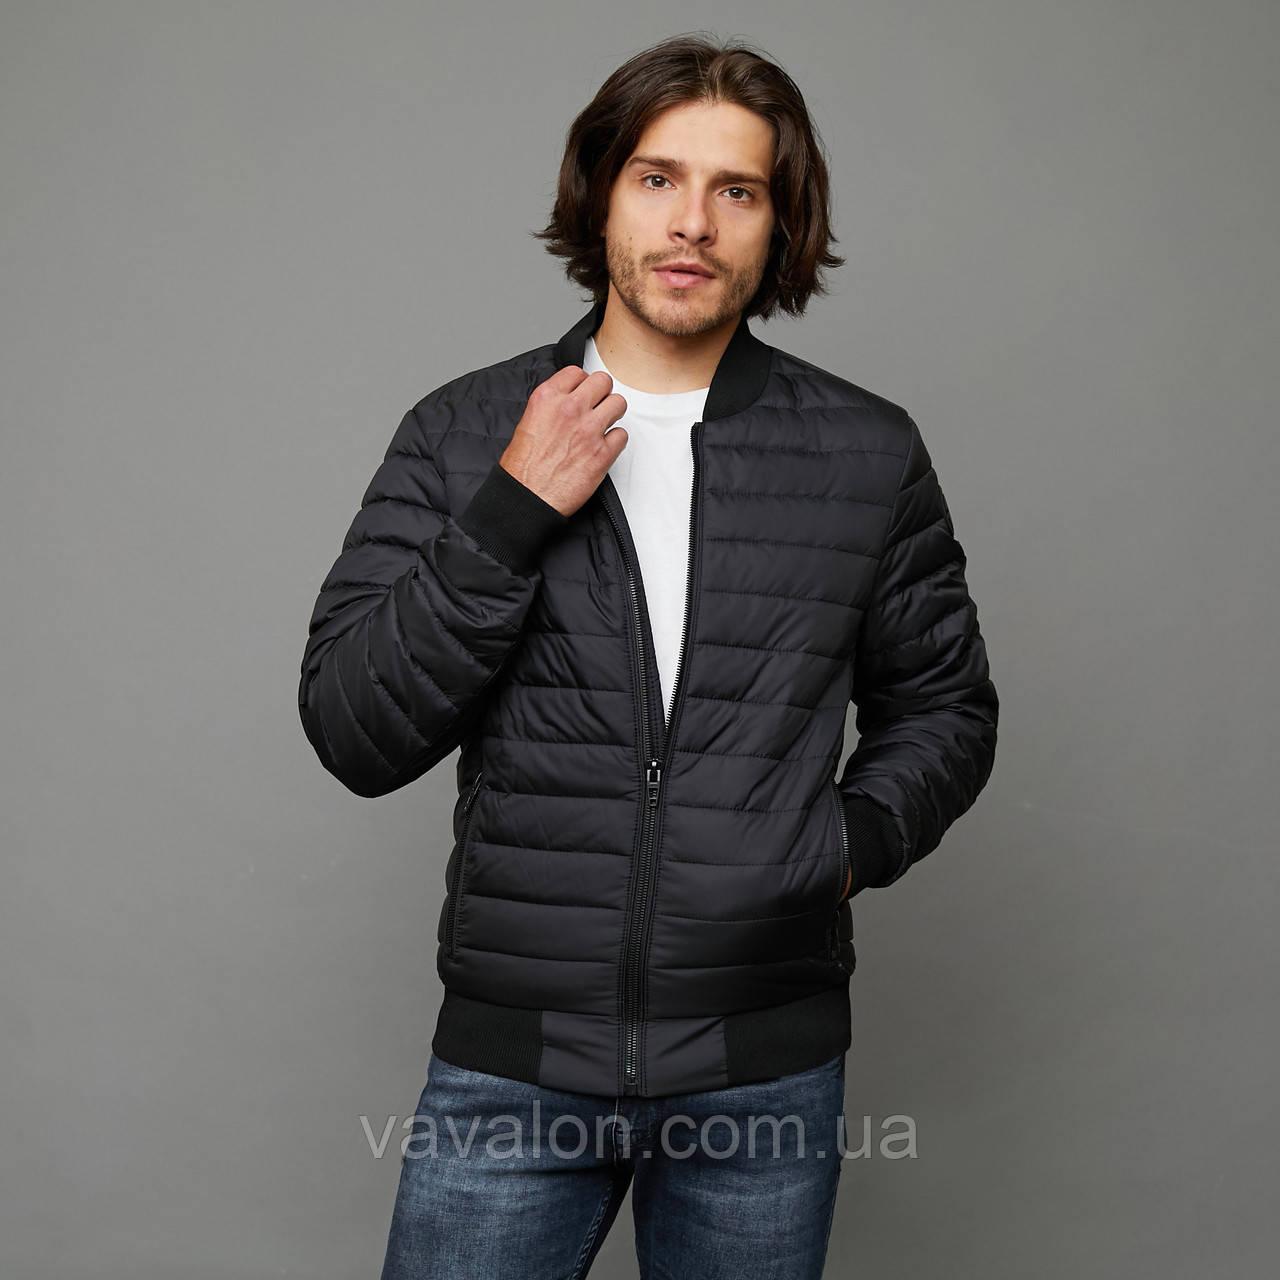 Куртка демисезонная Vavalon KD-933 Black